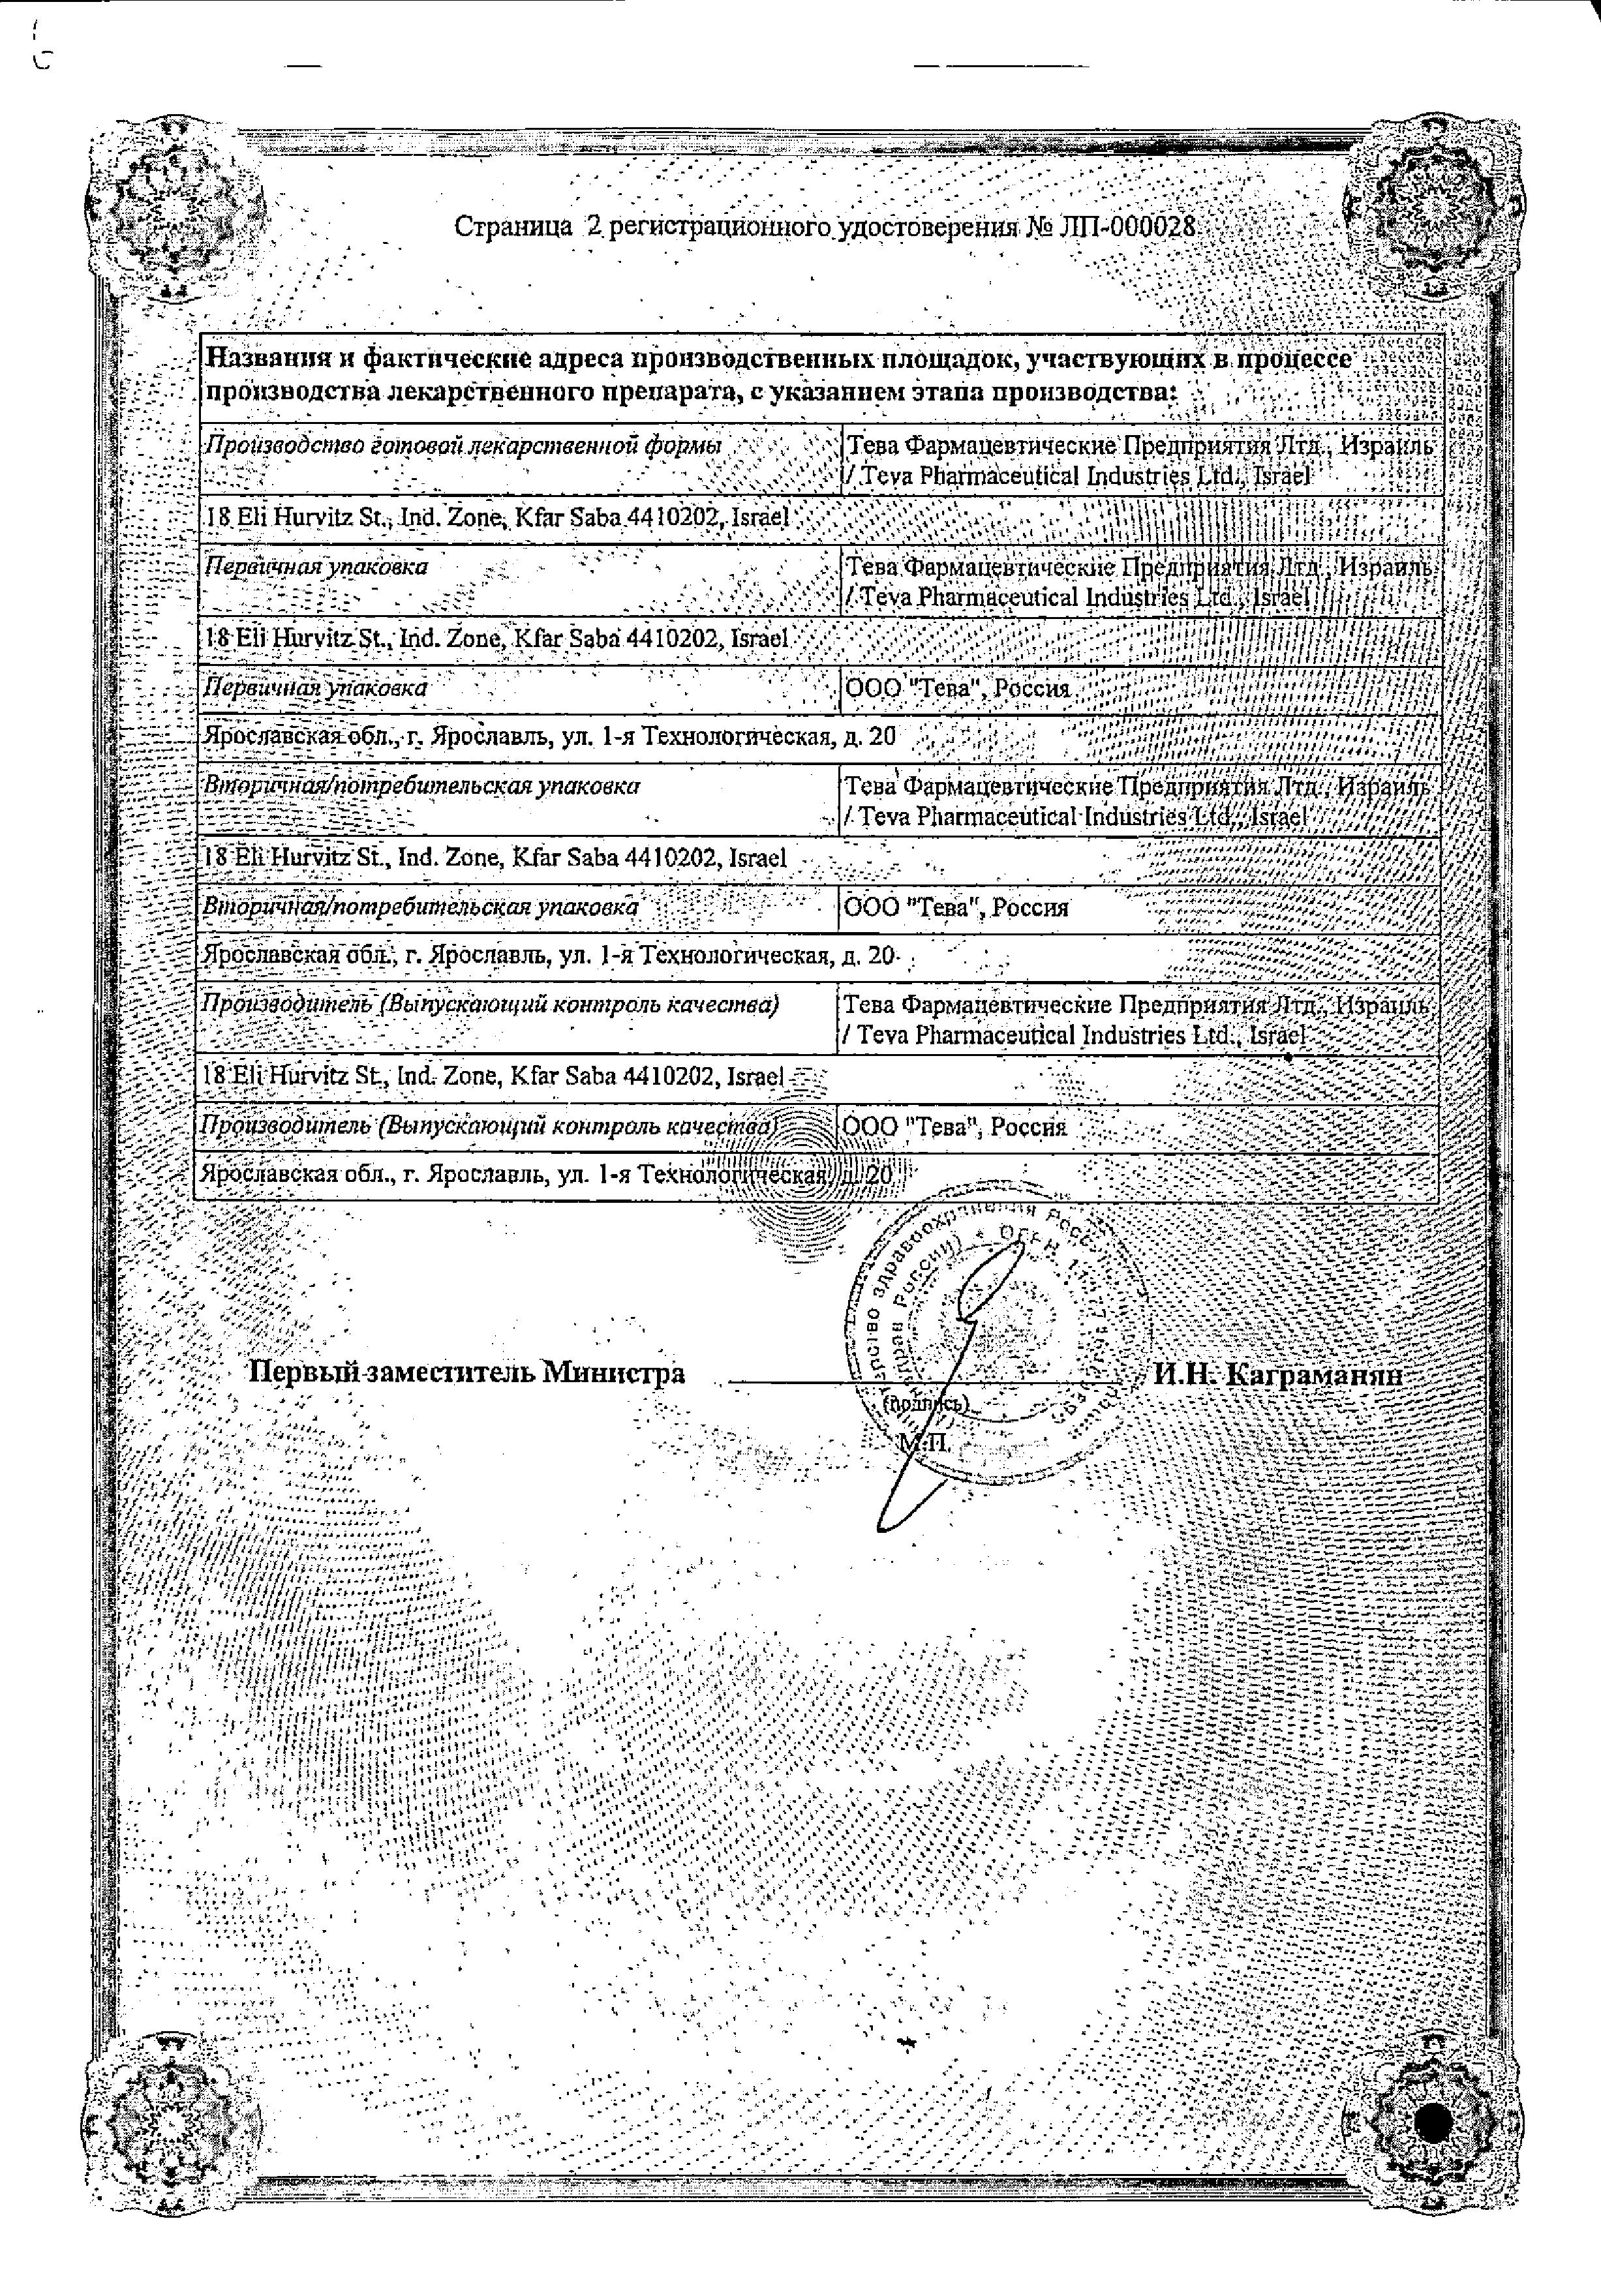 Метформин-Тева сертификат